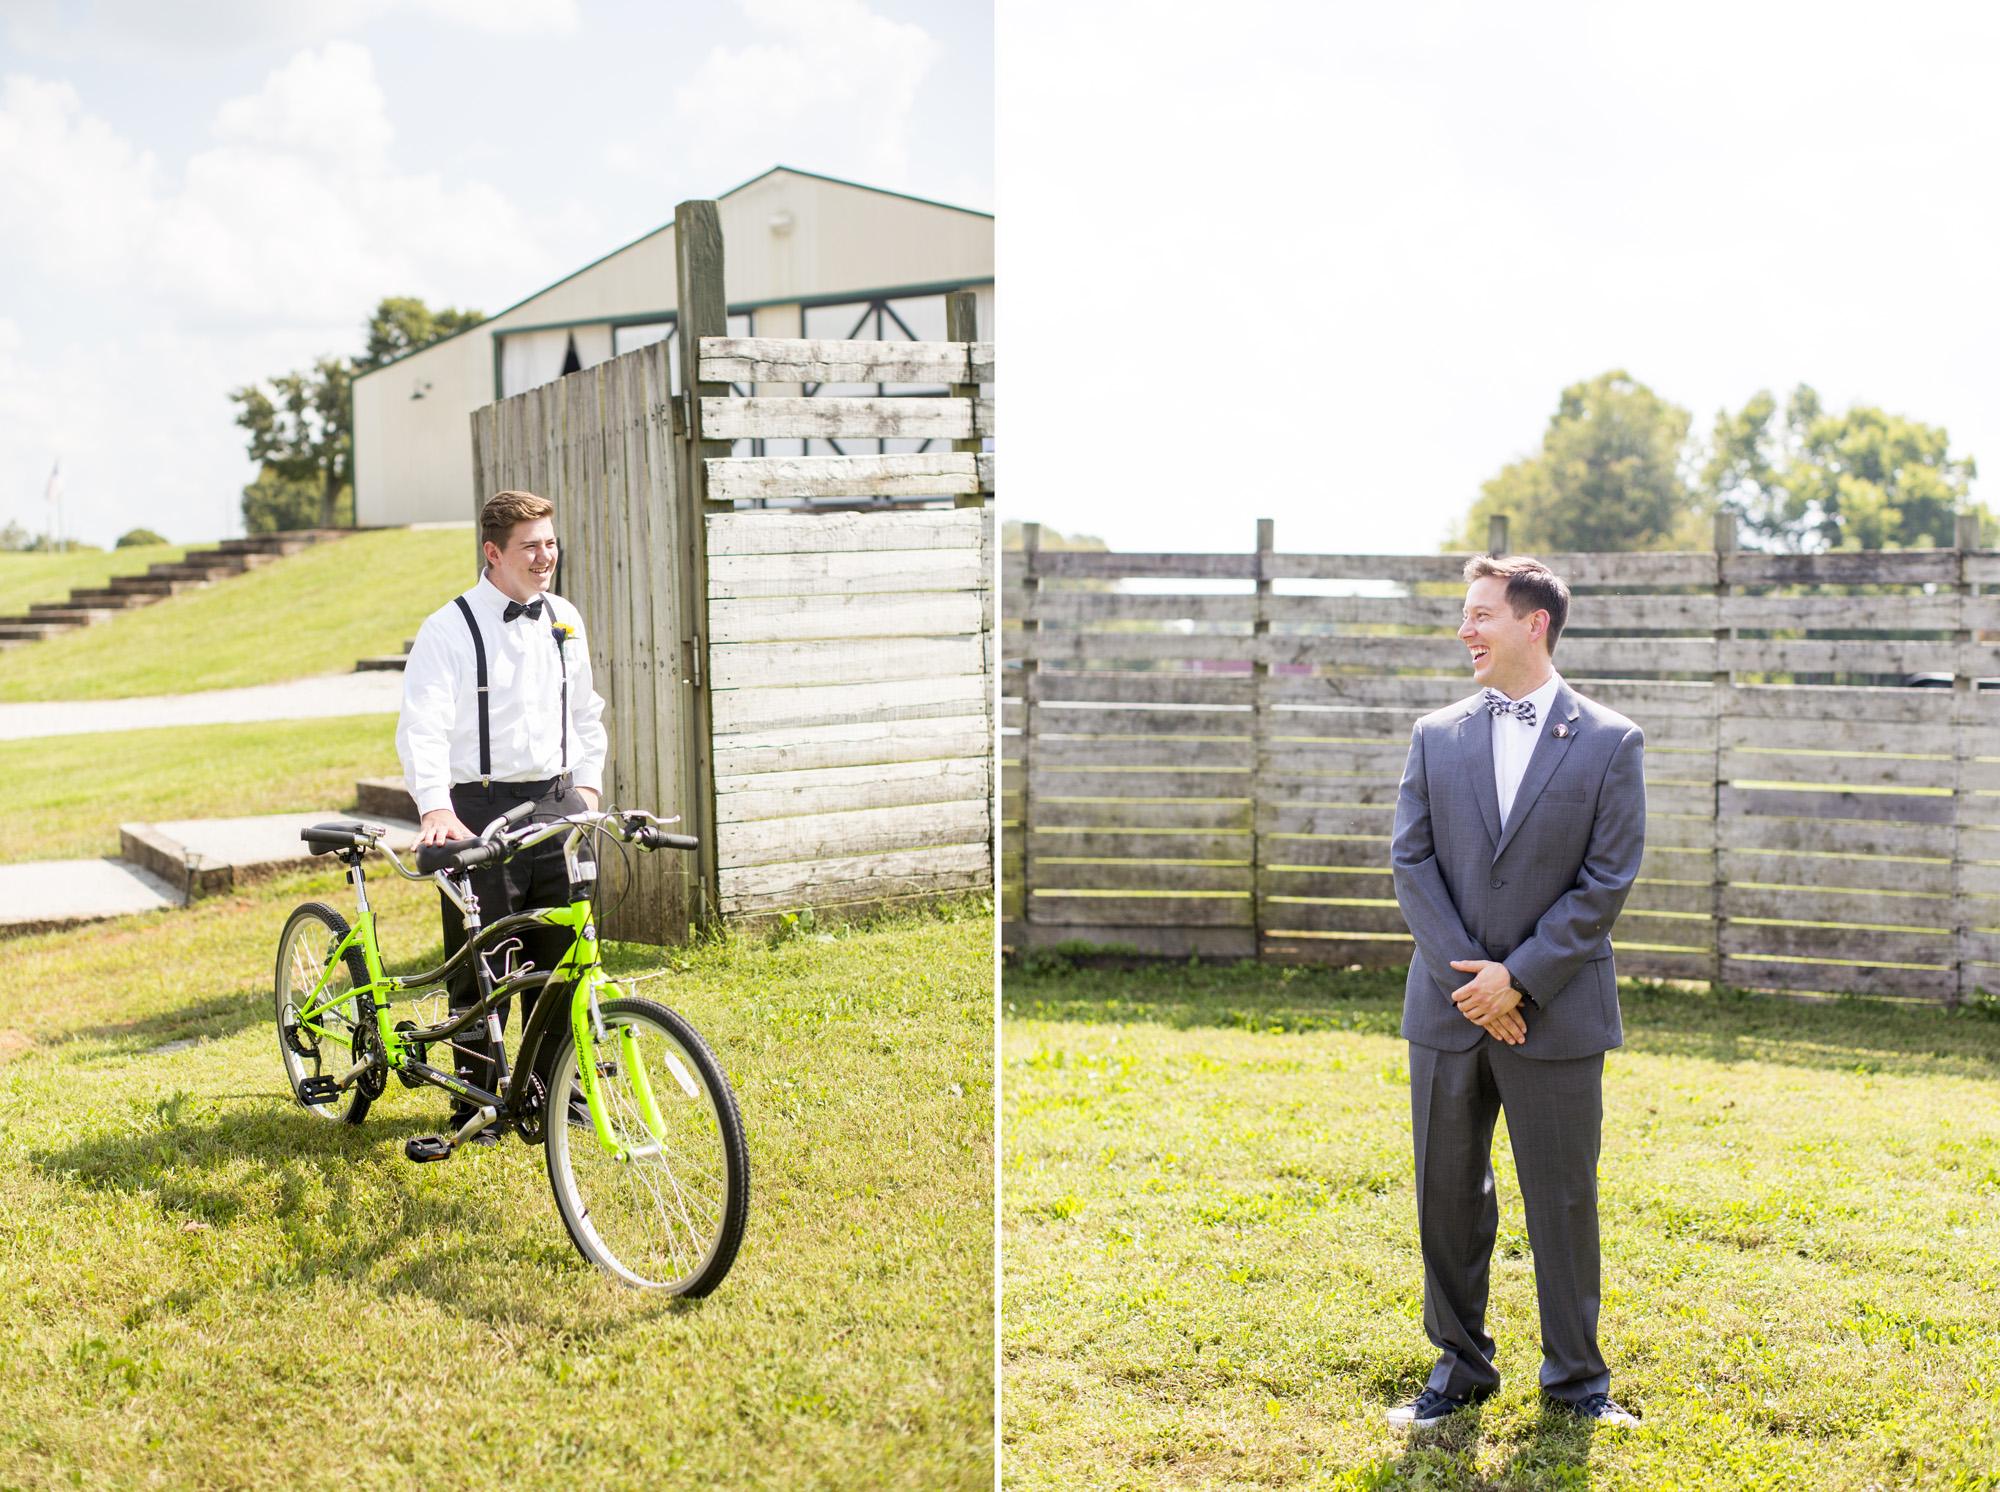 Seriously_Sabrina_Photography_Bowling_Green_Kentucky_Highland_Stables_Wedding_Wolff40.jpg